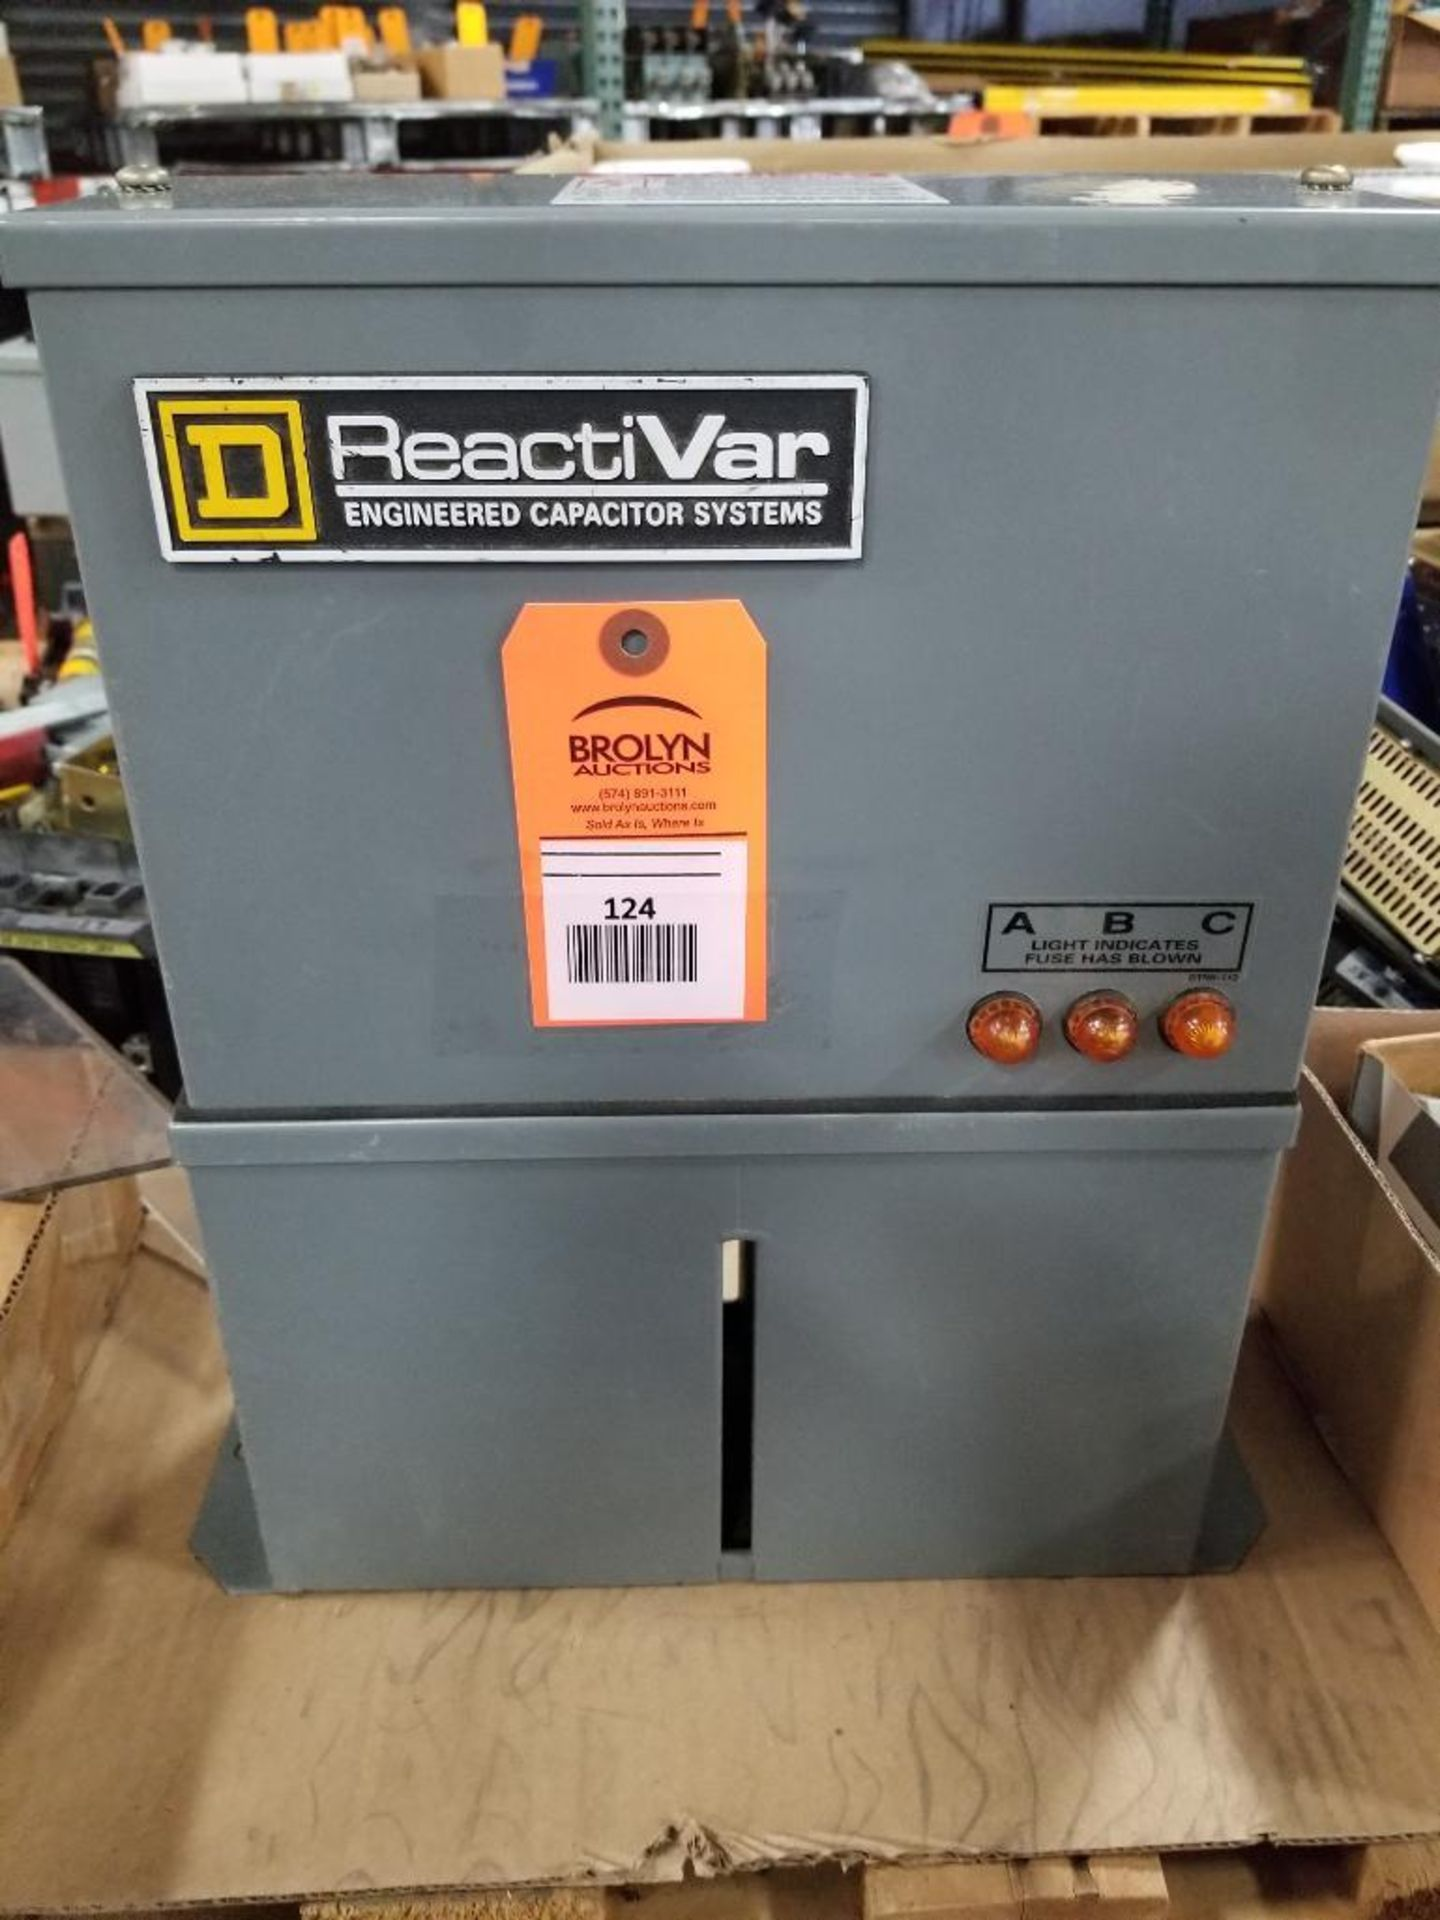 Square-D ReactiVar PFCD4010F 3PH Power factor correction capacitor.